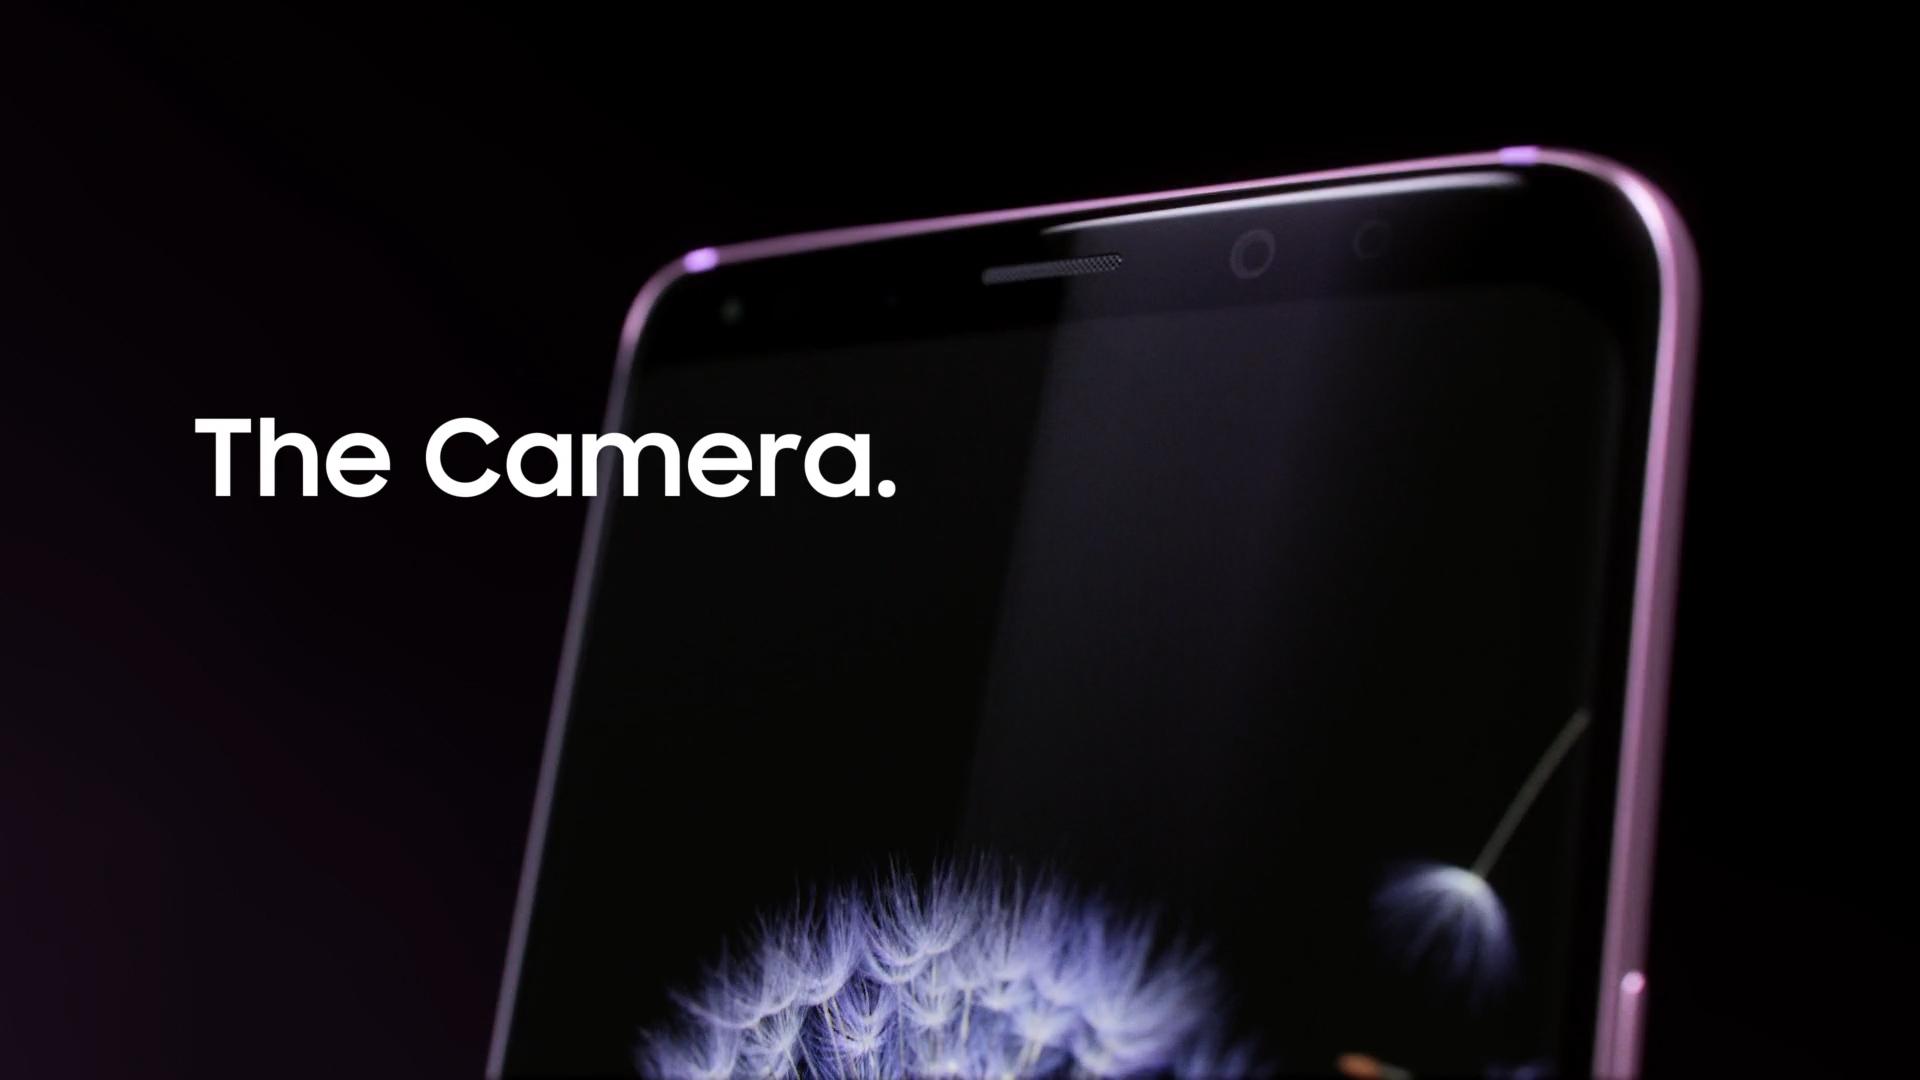 Houdini work on Samsung Galaxy S9 intro 2